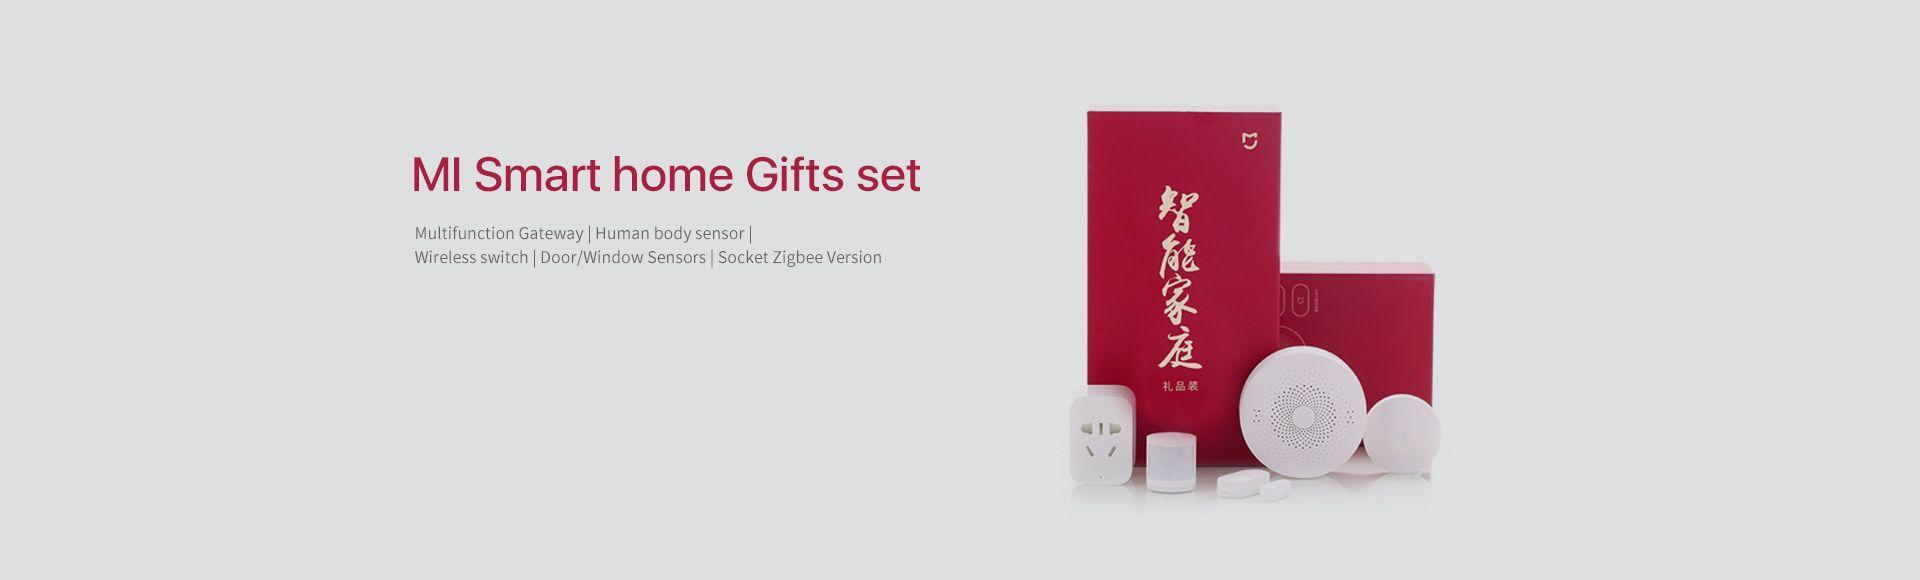 Xiaomi Mi Smart Home Kit - New gateway, Wireless switch, Human body sensor, Socket zigbee version, Door and window sensor